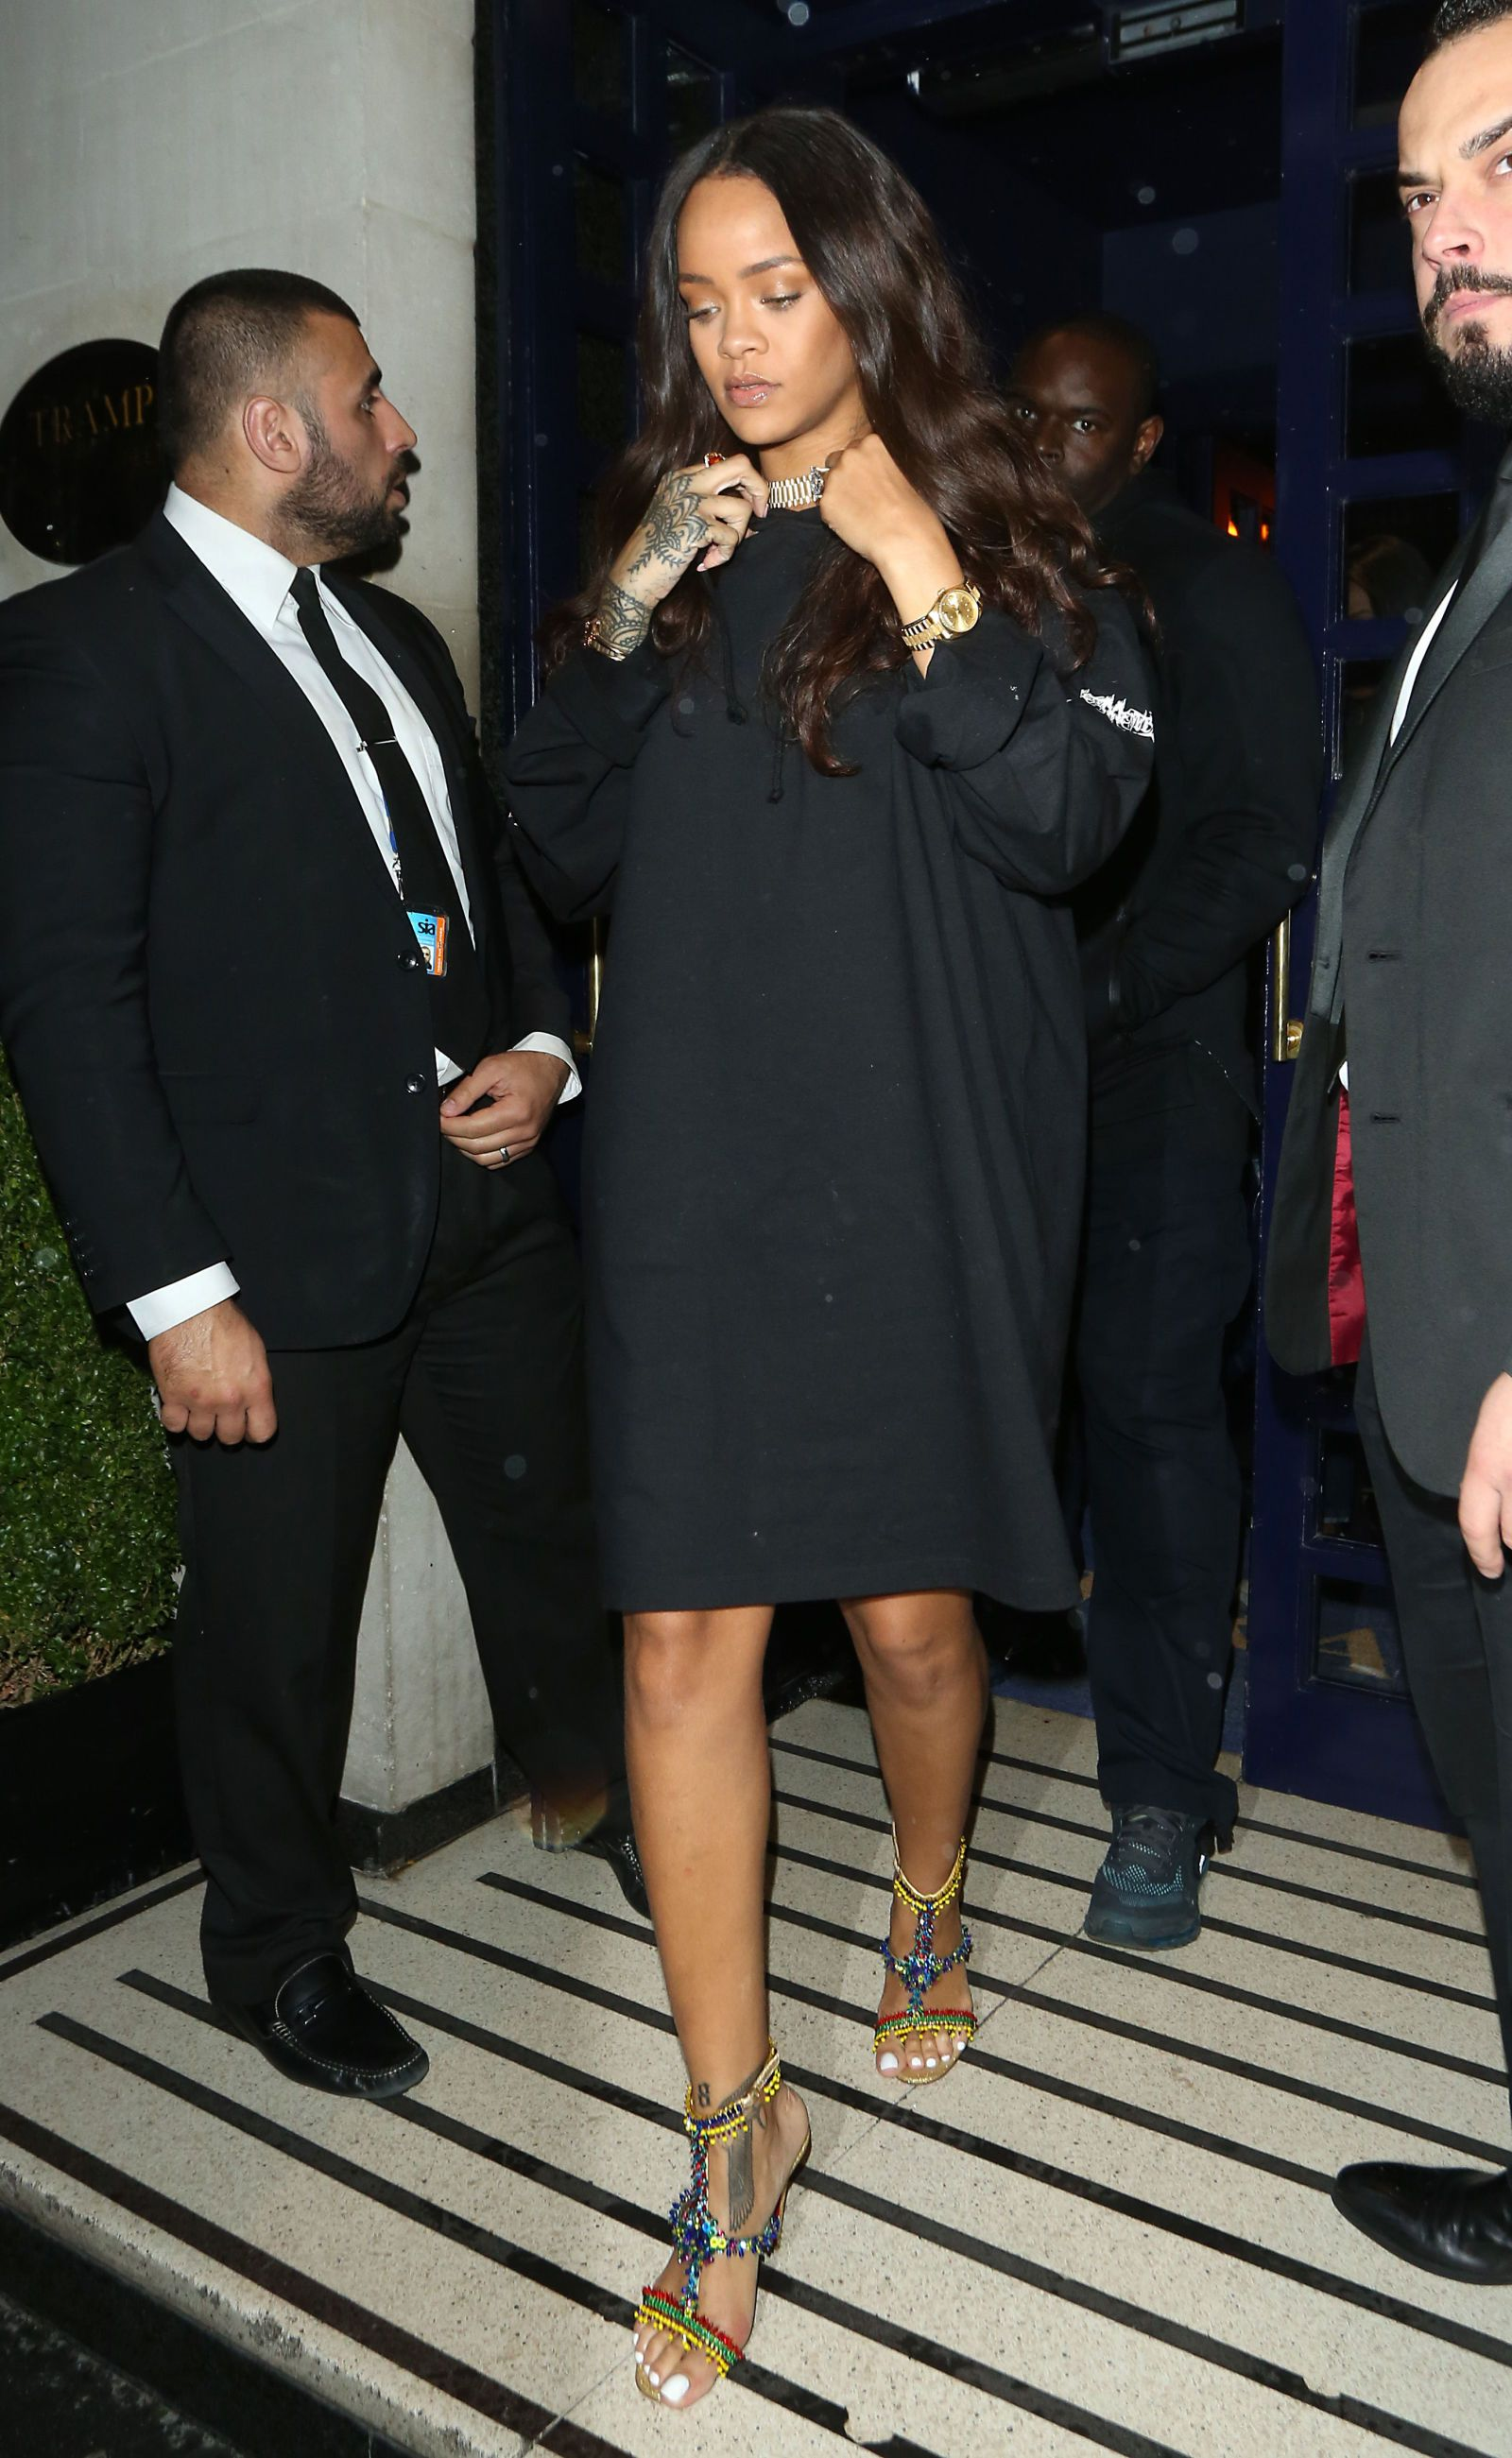 85daf78e6f9 Rihanna Makes Yankee Gear Look So Good